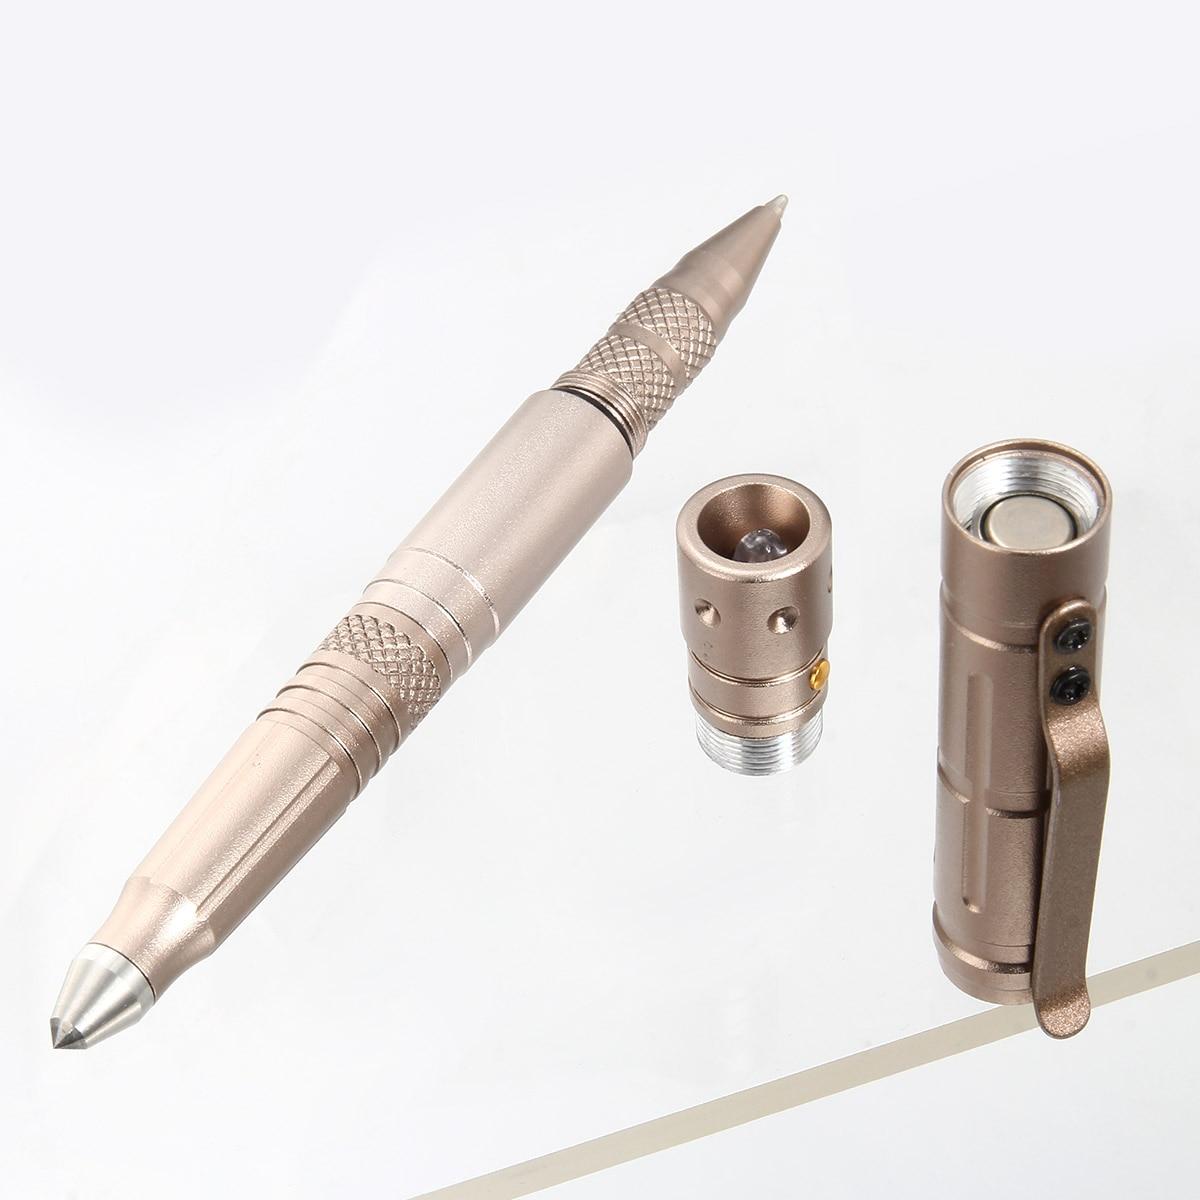 Multi-function Tactical Pen Survival Military LED Flashlight Glass Breaker Self Defense Tool Ballpoint Pens JFlyer